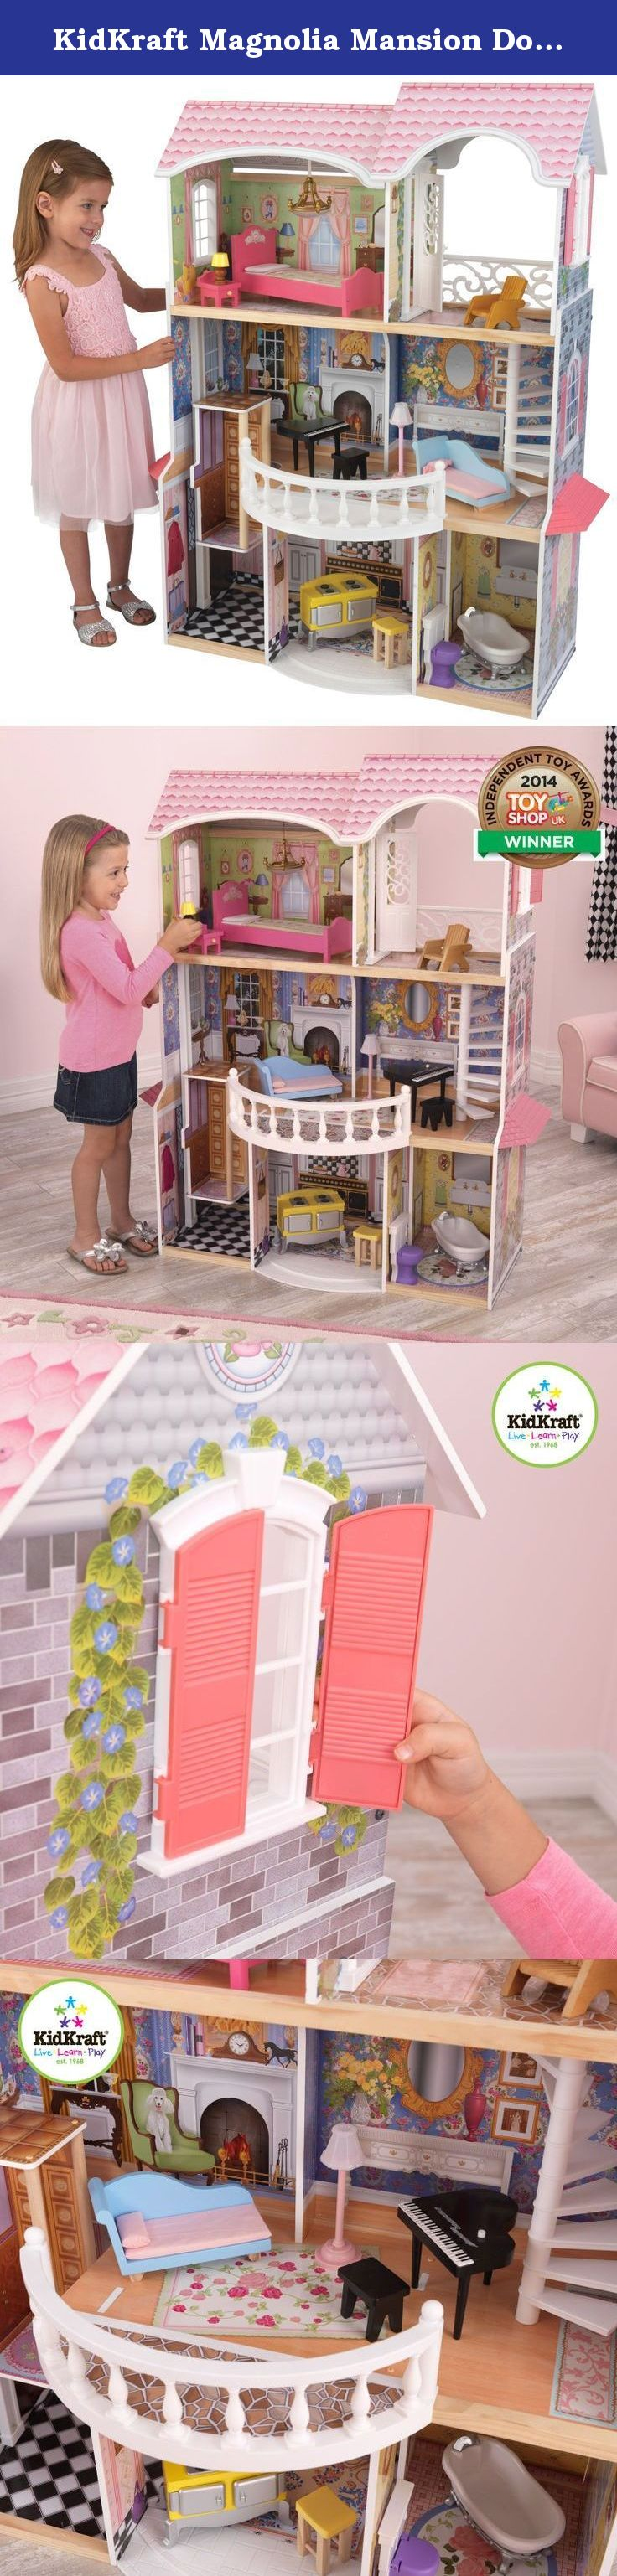 Kidkraft Magnolia Mansion Dollhouse With Furniture The Magnolia